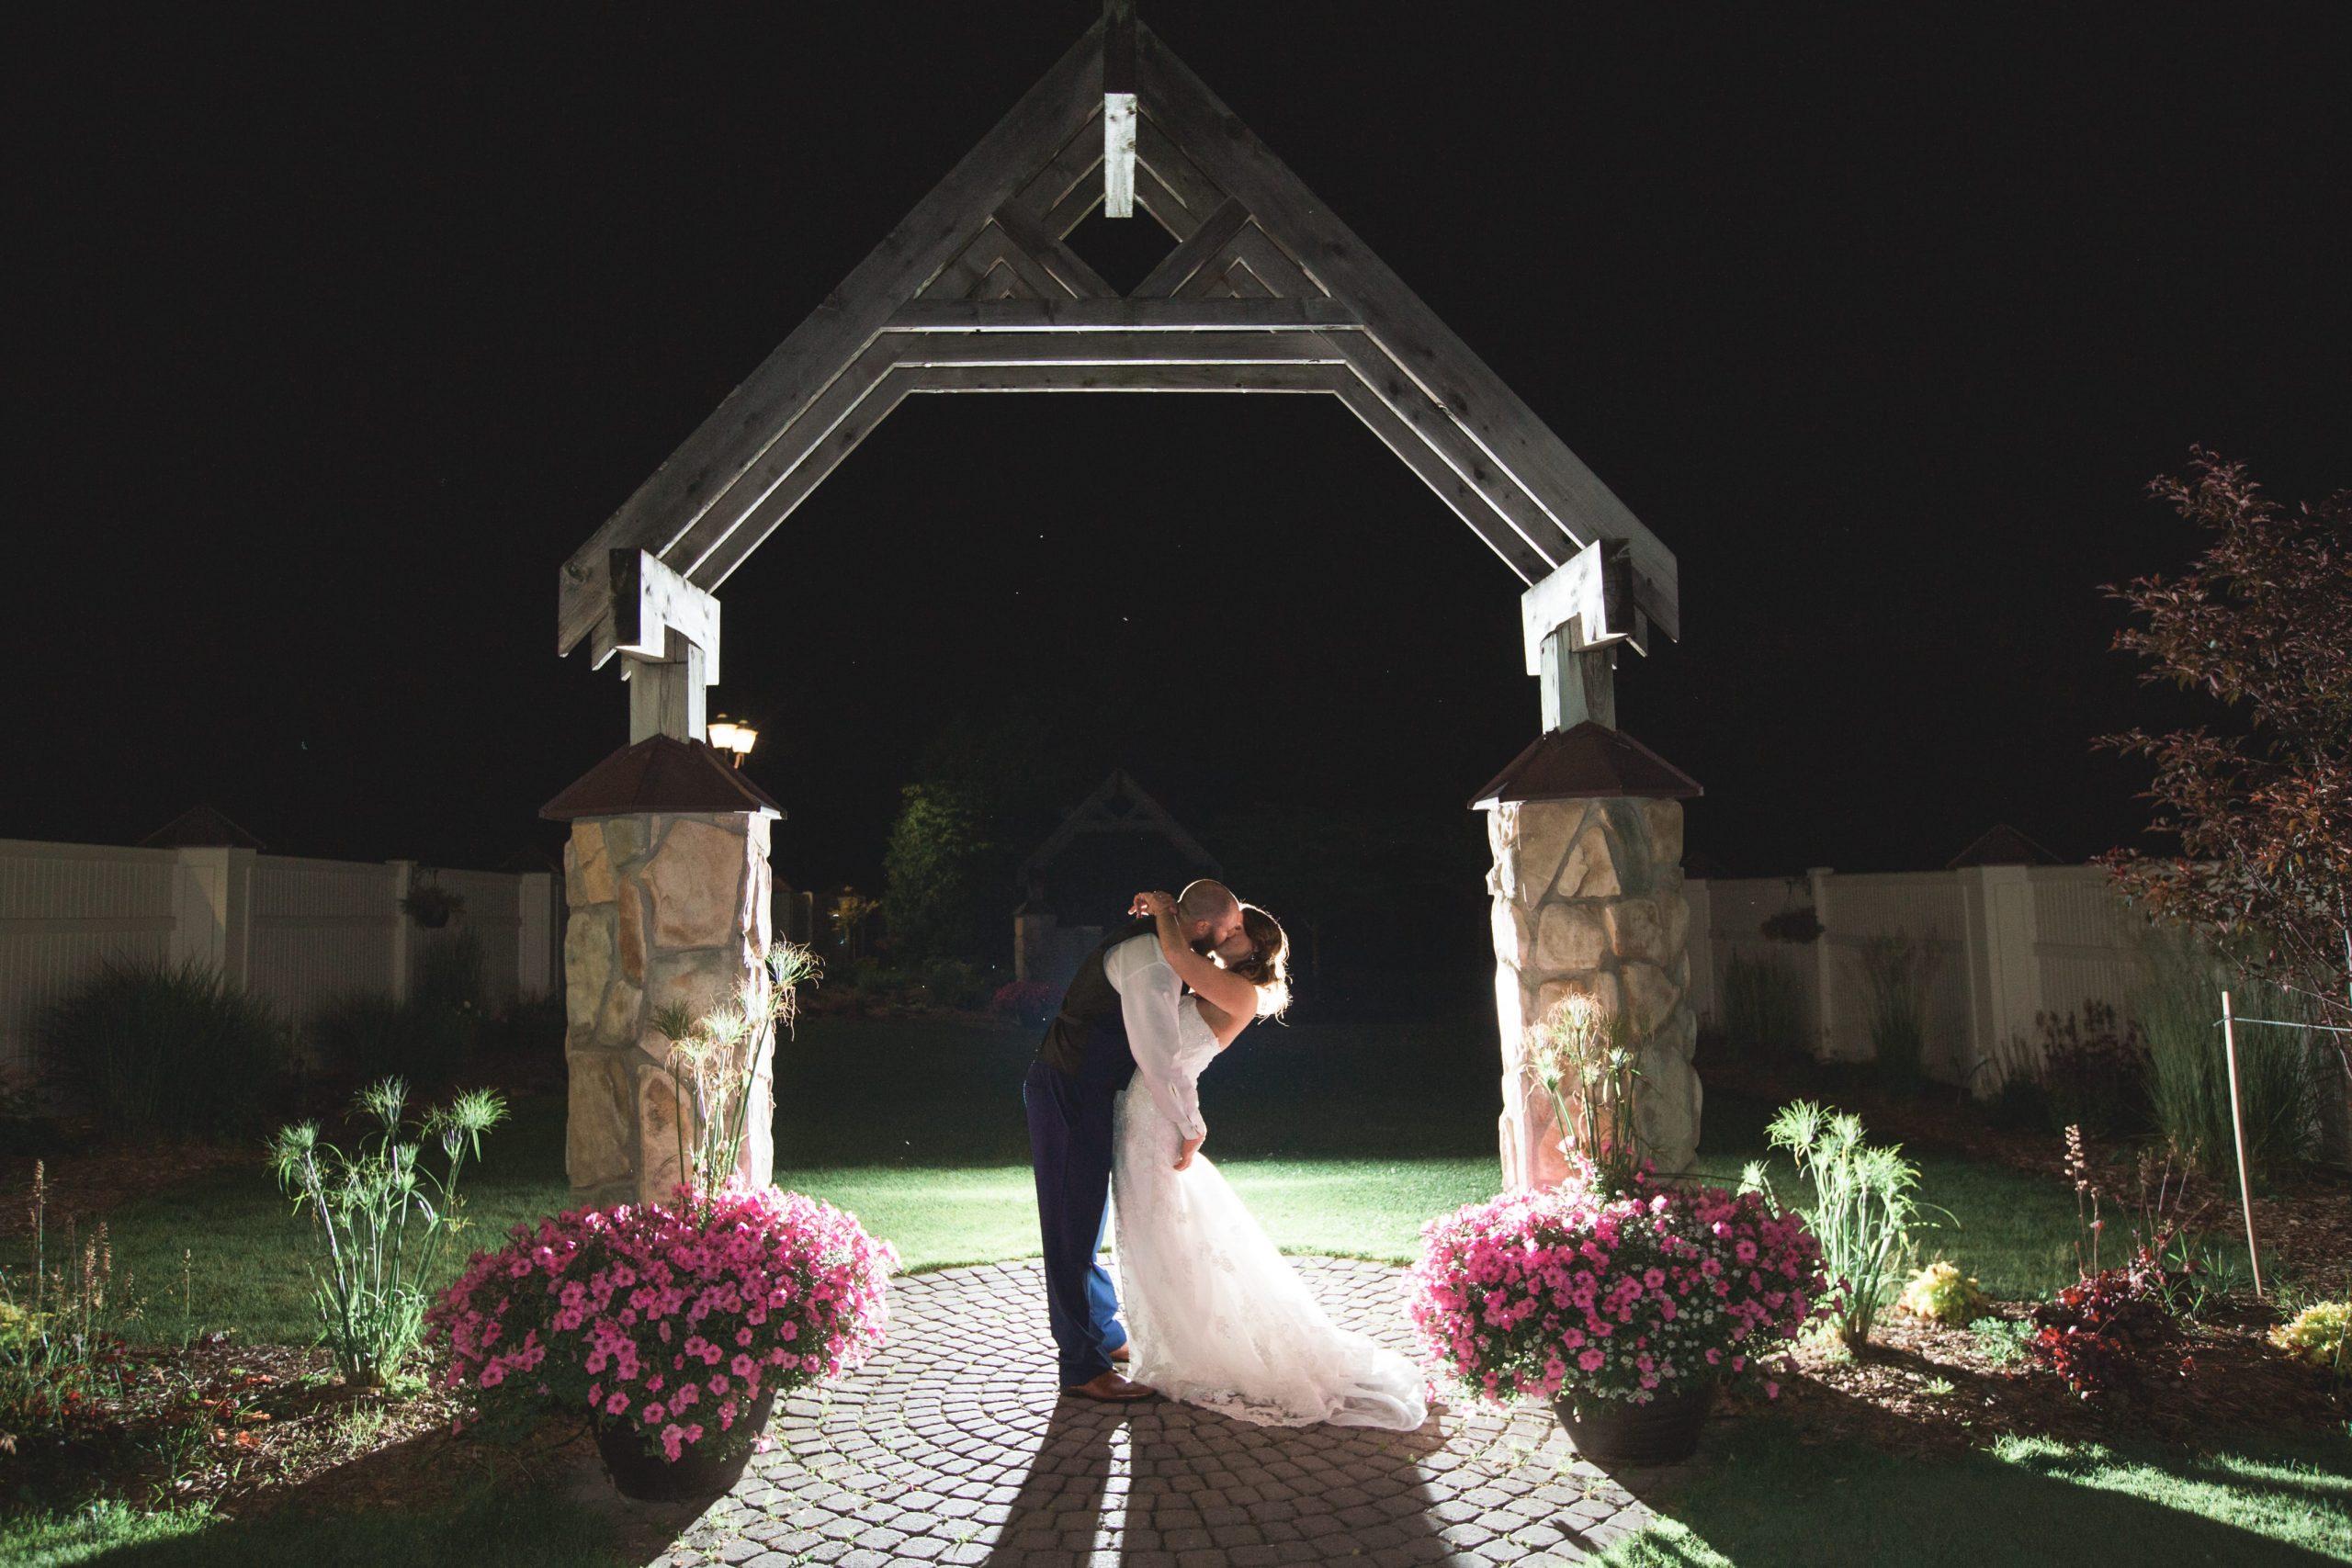 wedding evening romantics